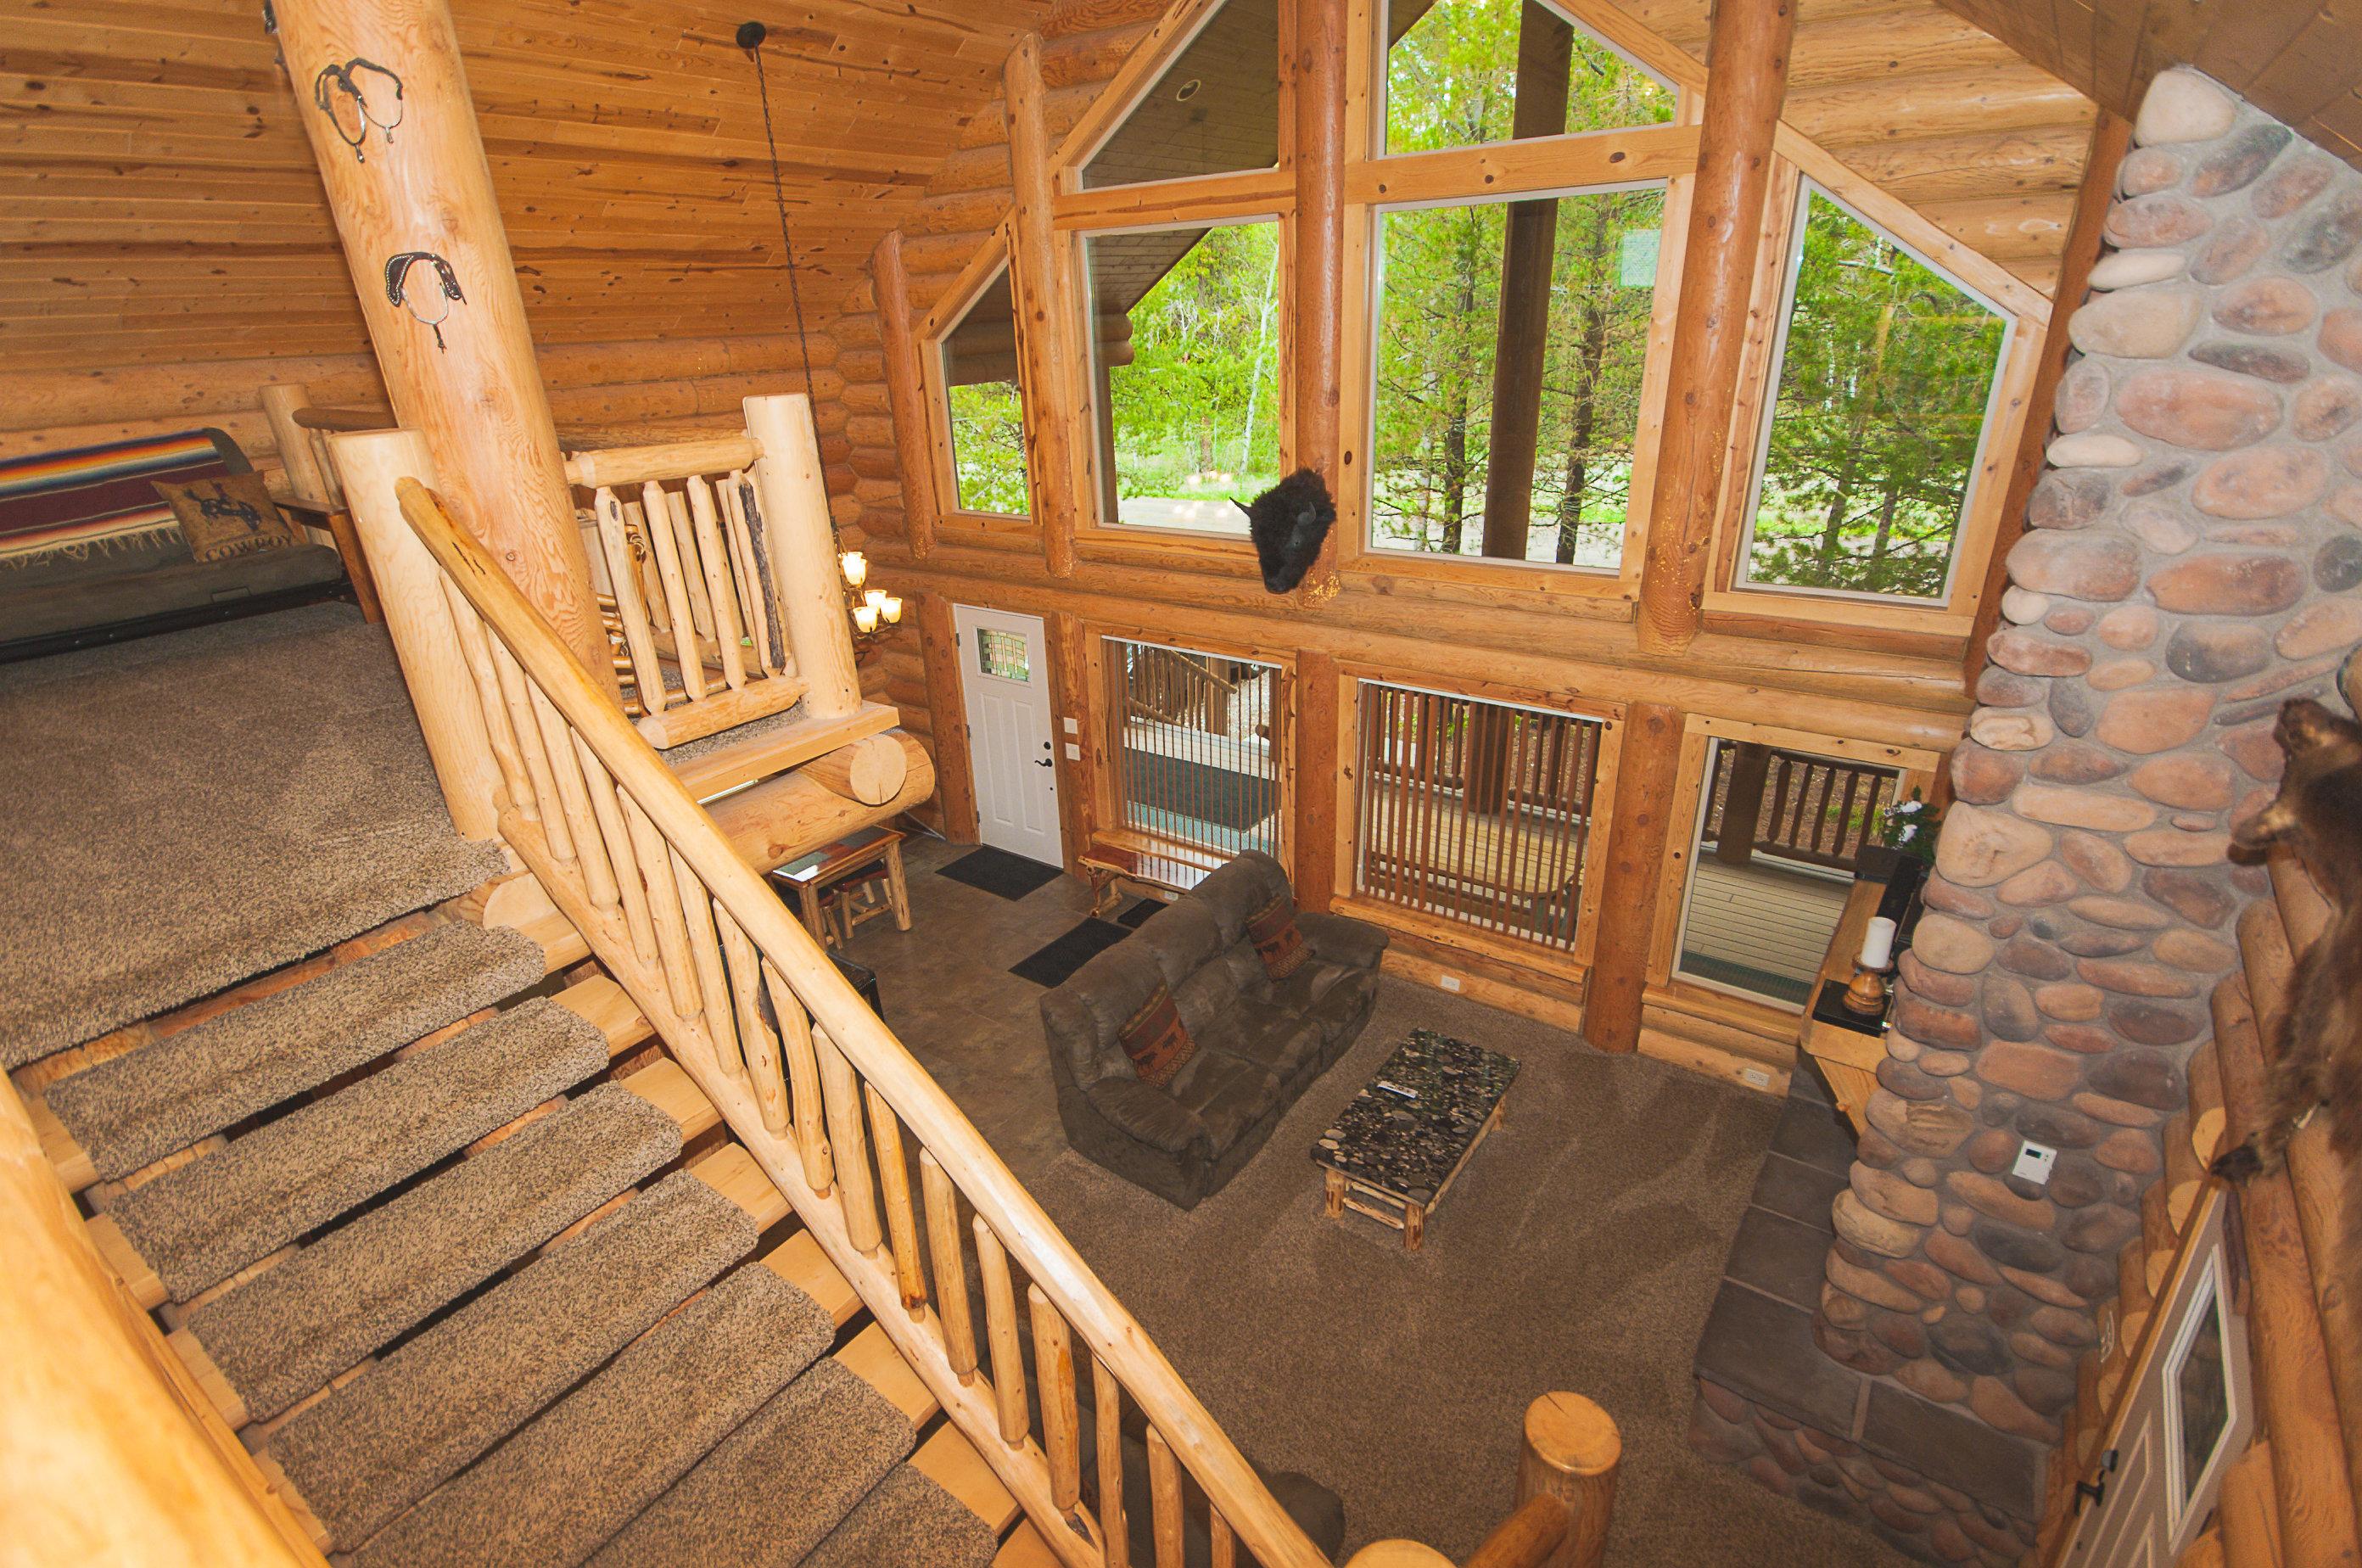 8. C25 Loft to Living Room